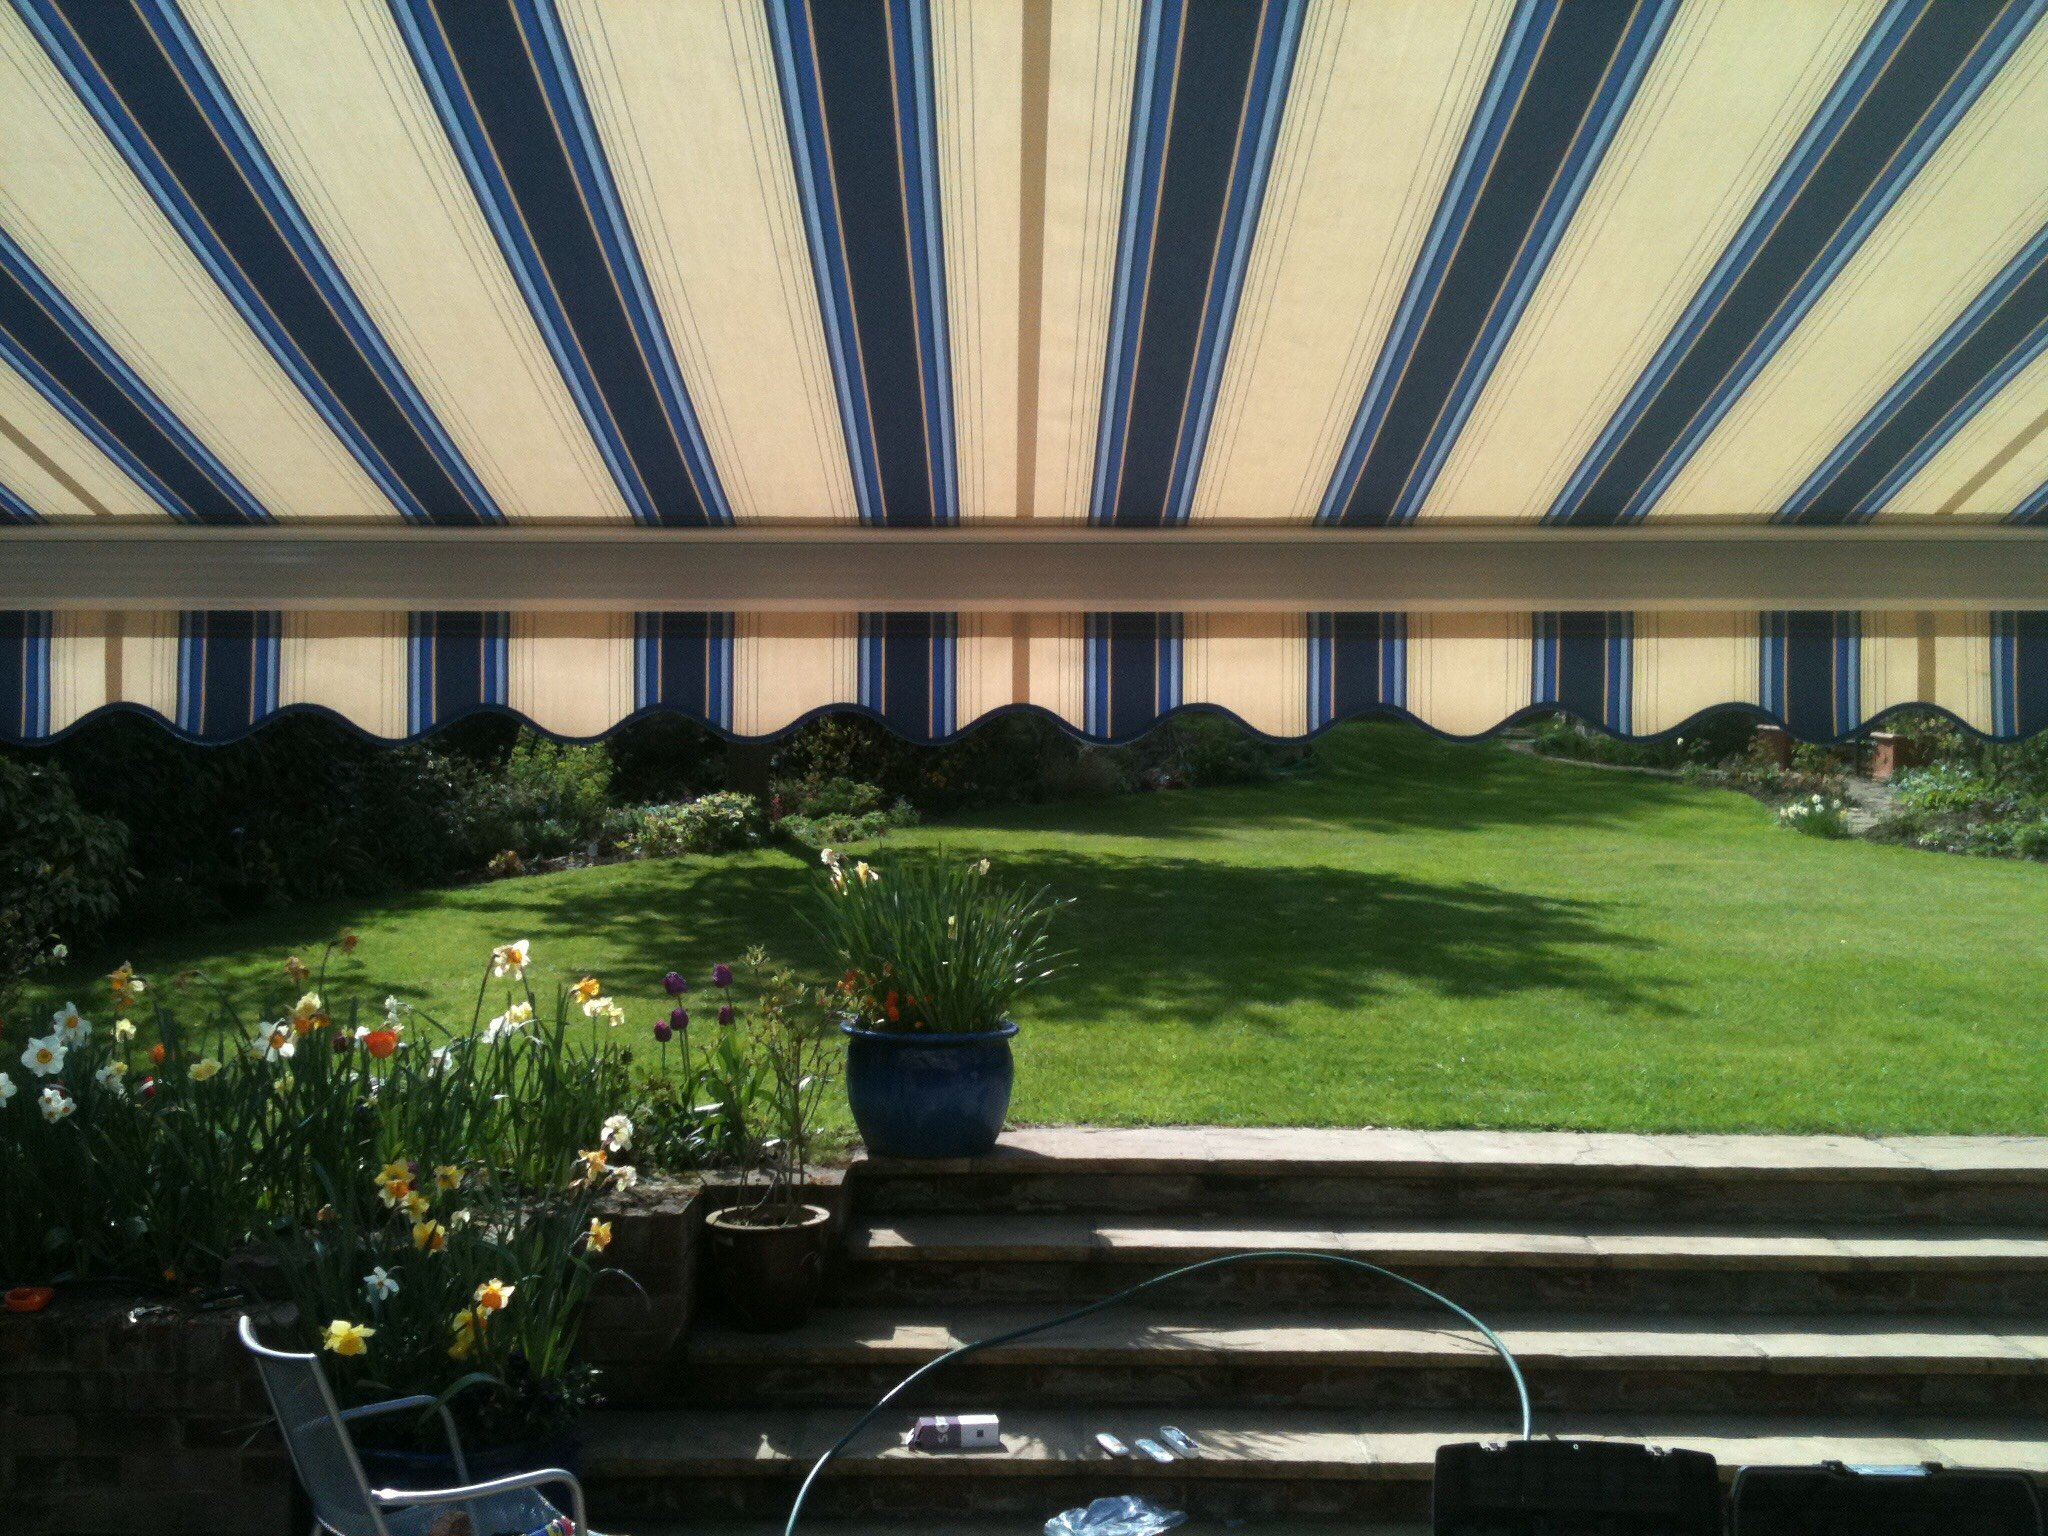 awning in garden